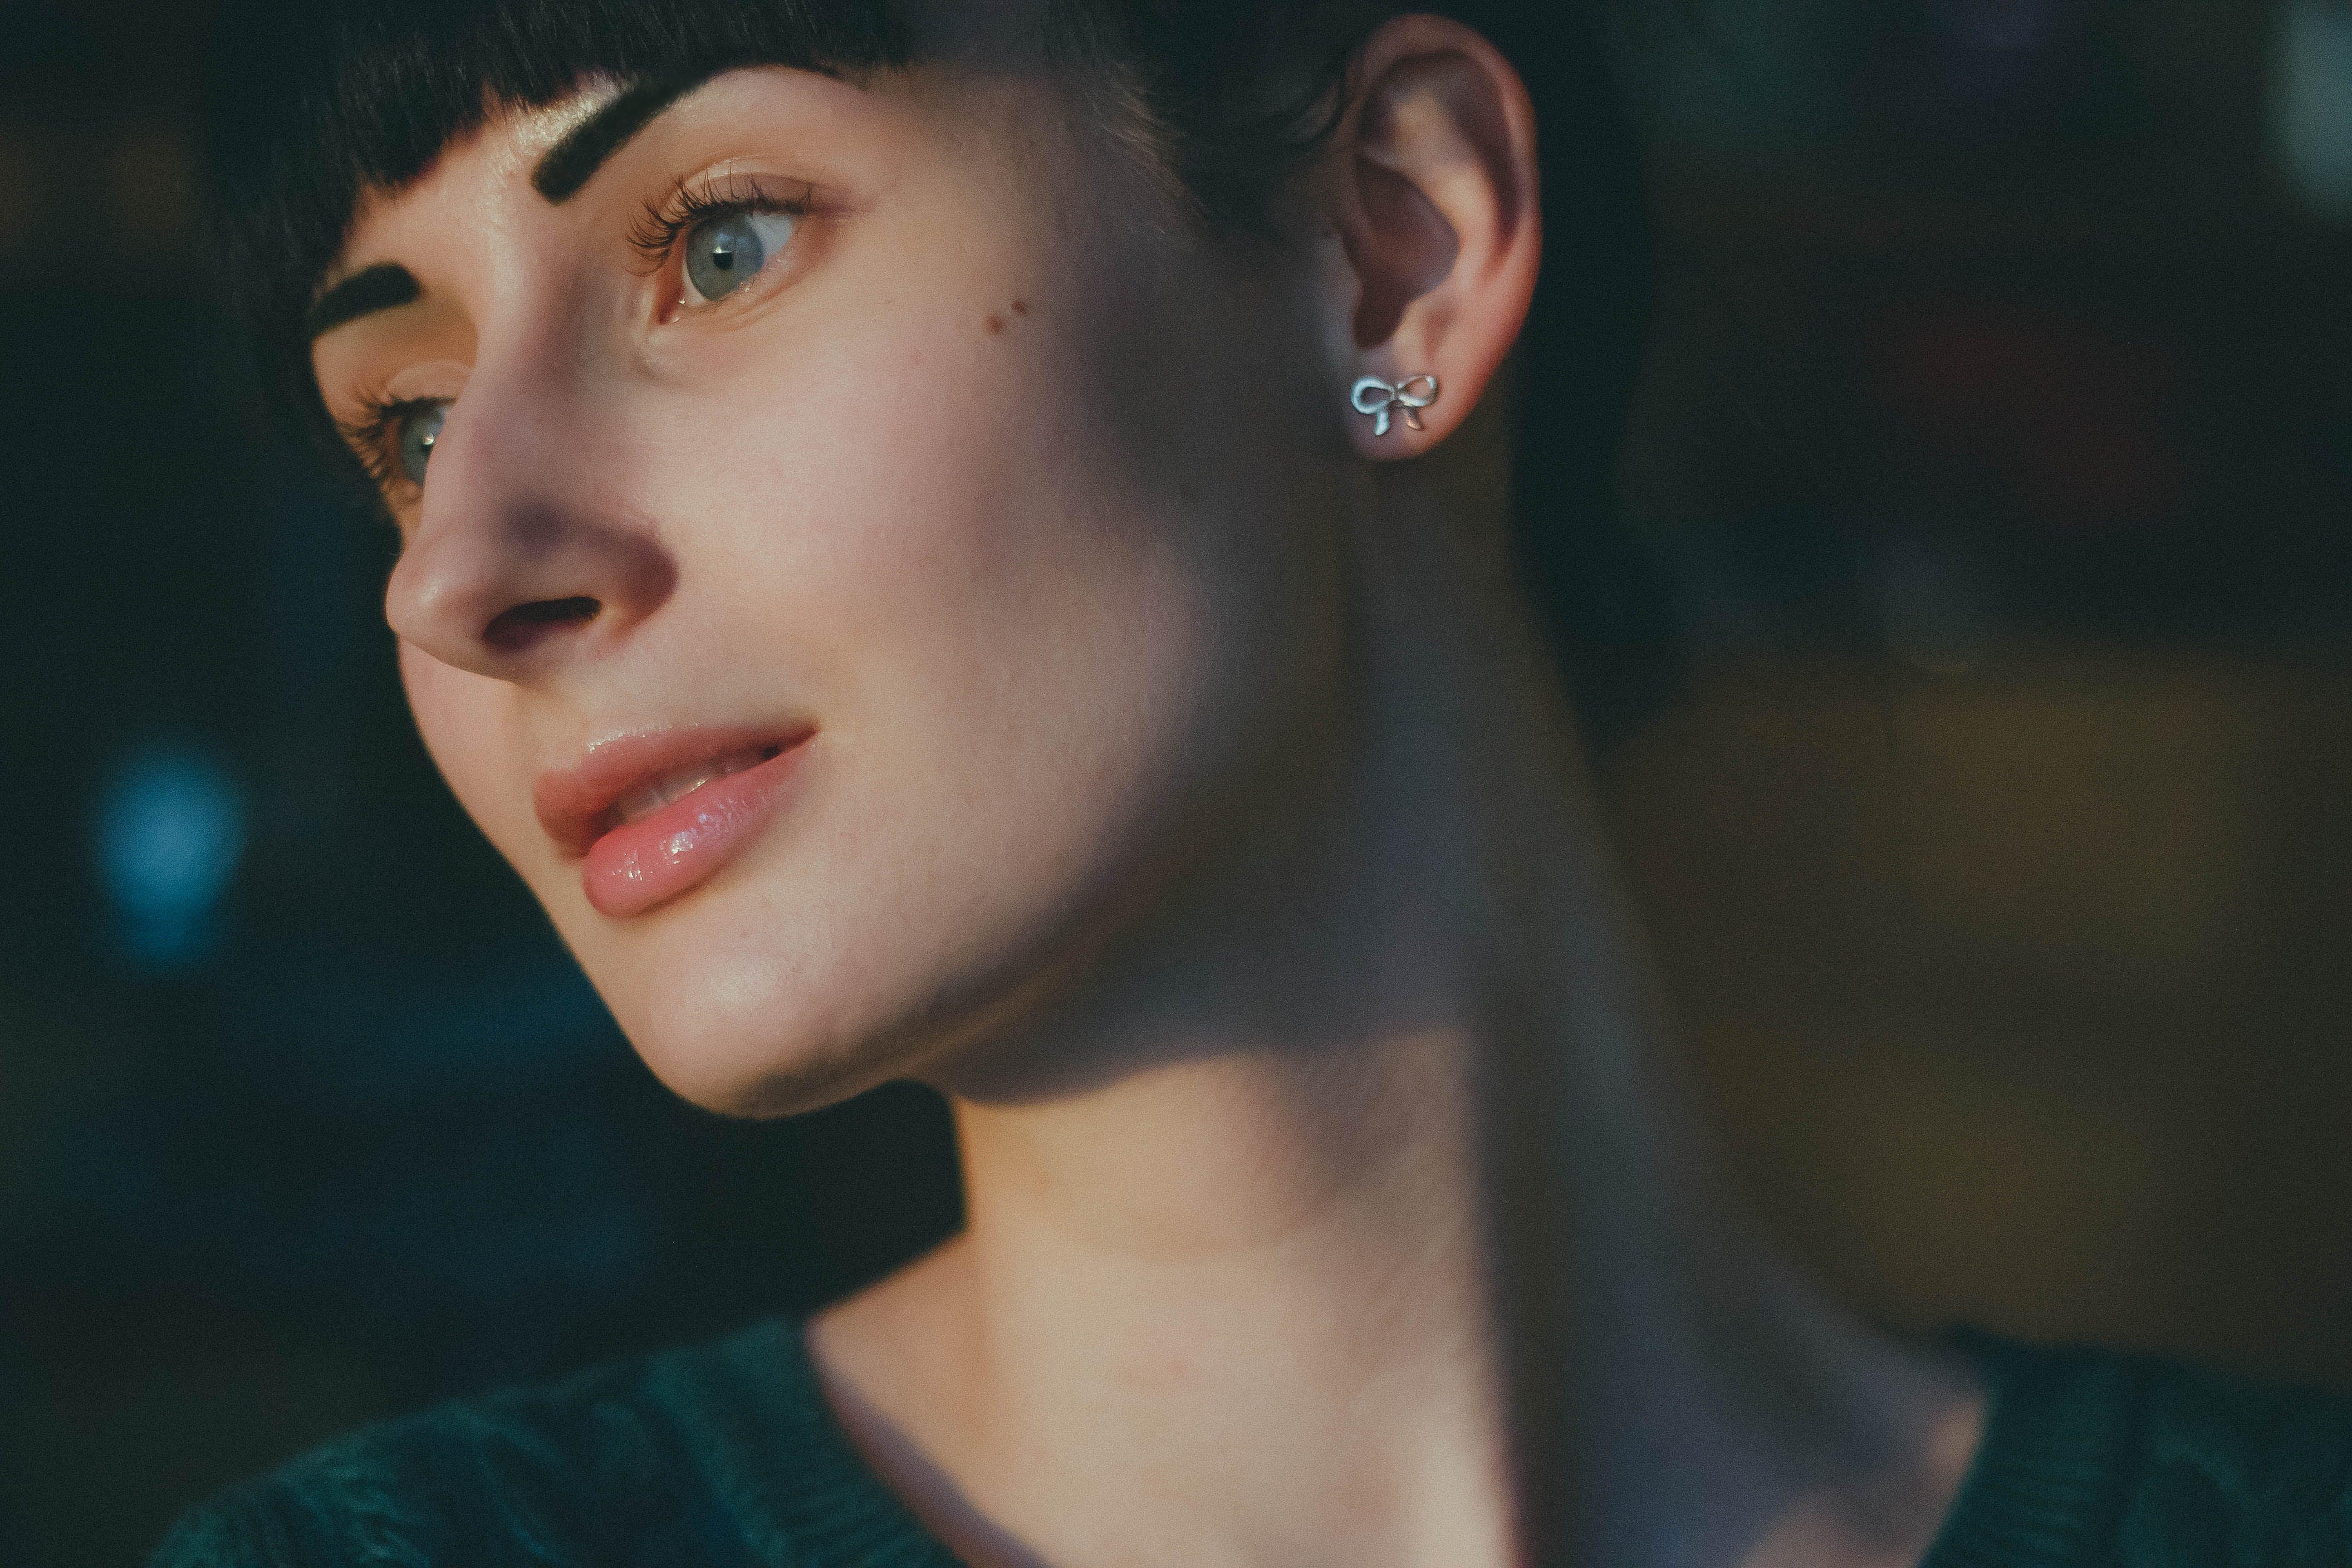 Woman Wearing Silver Earrings and Green Shirt